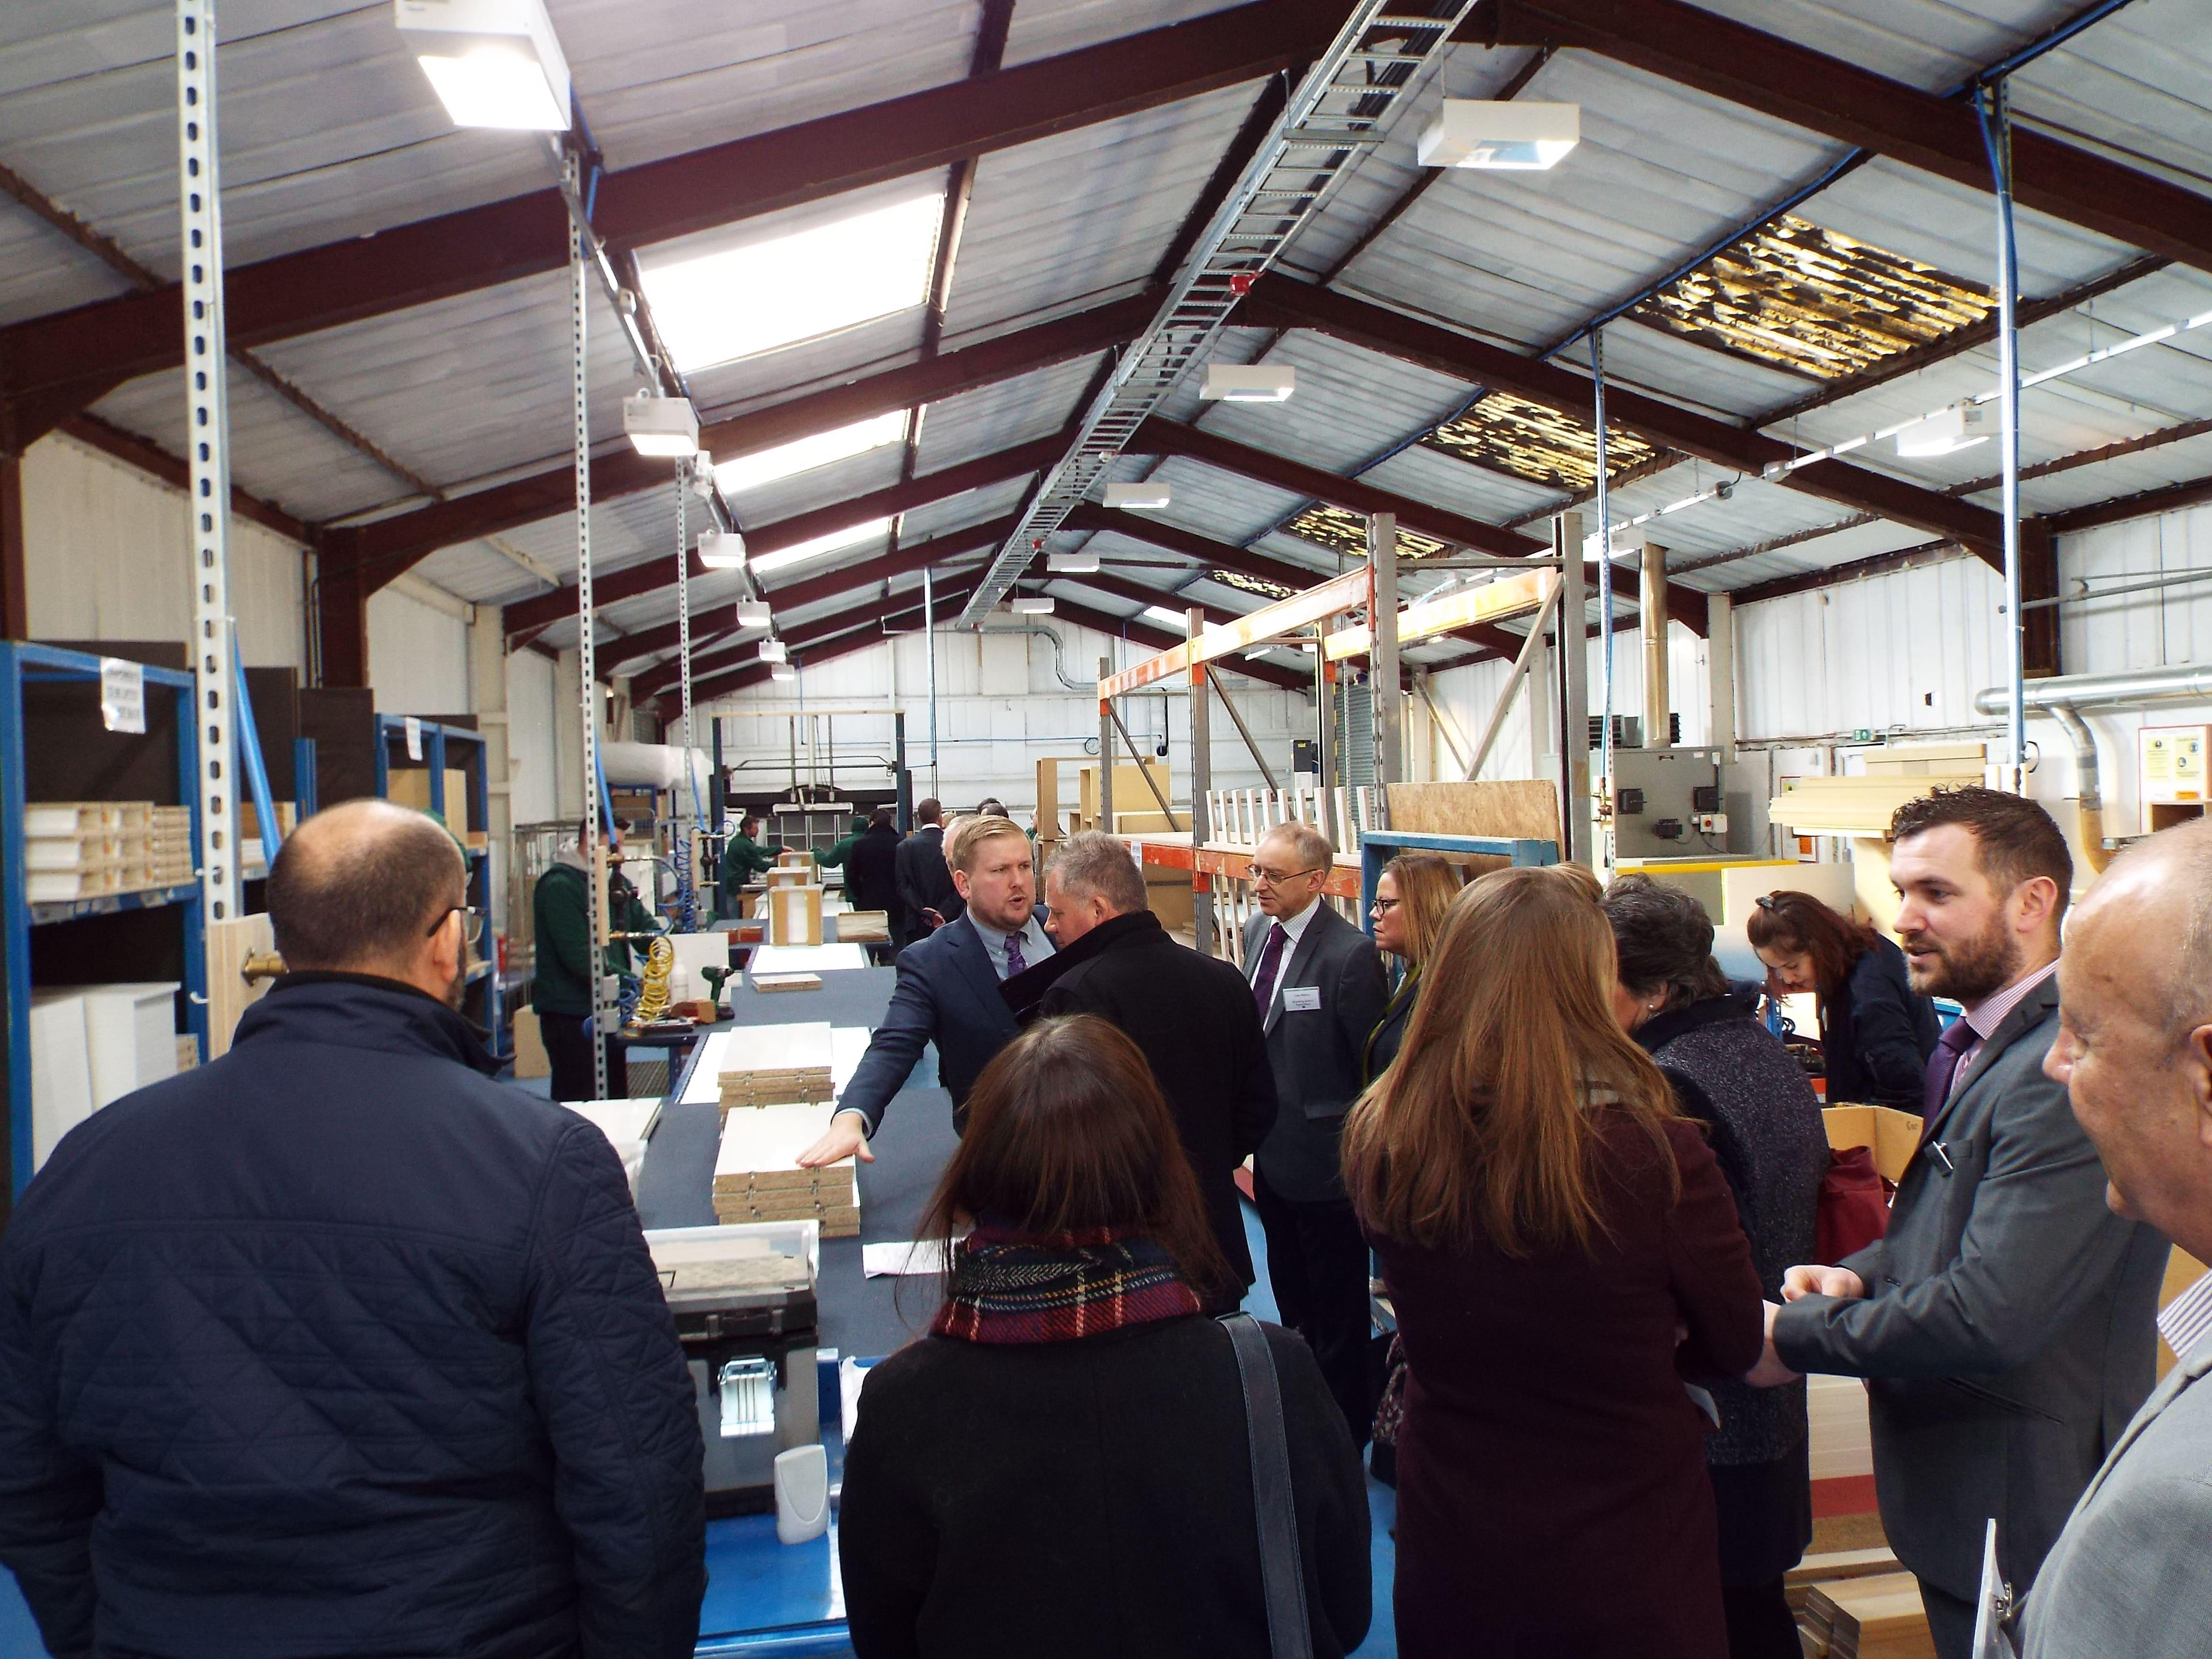 Guest visited Witley Jones Furniture assembly unit